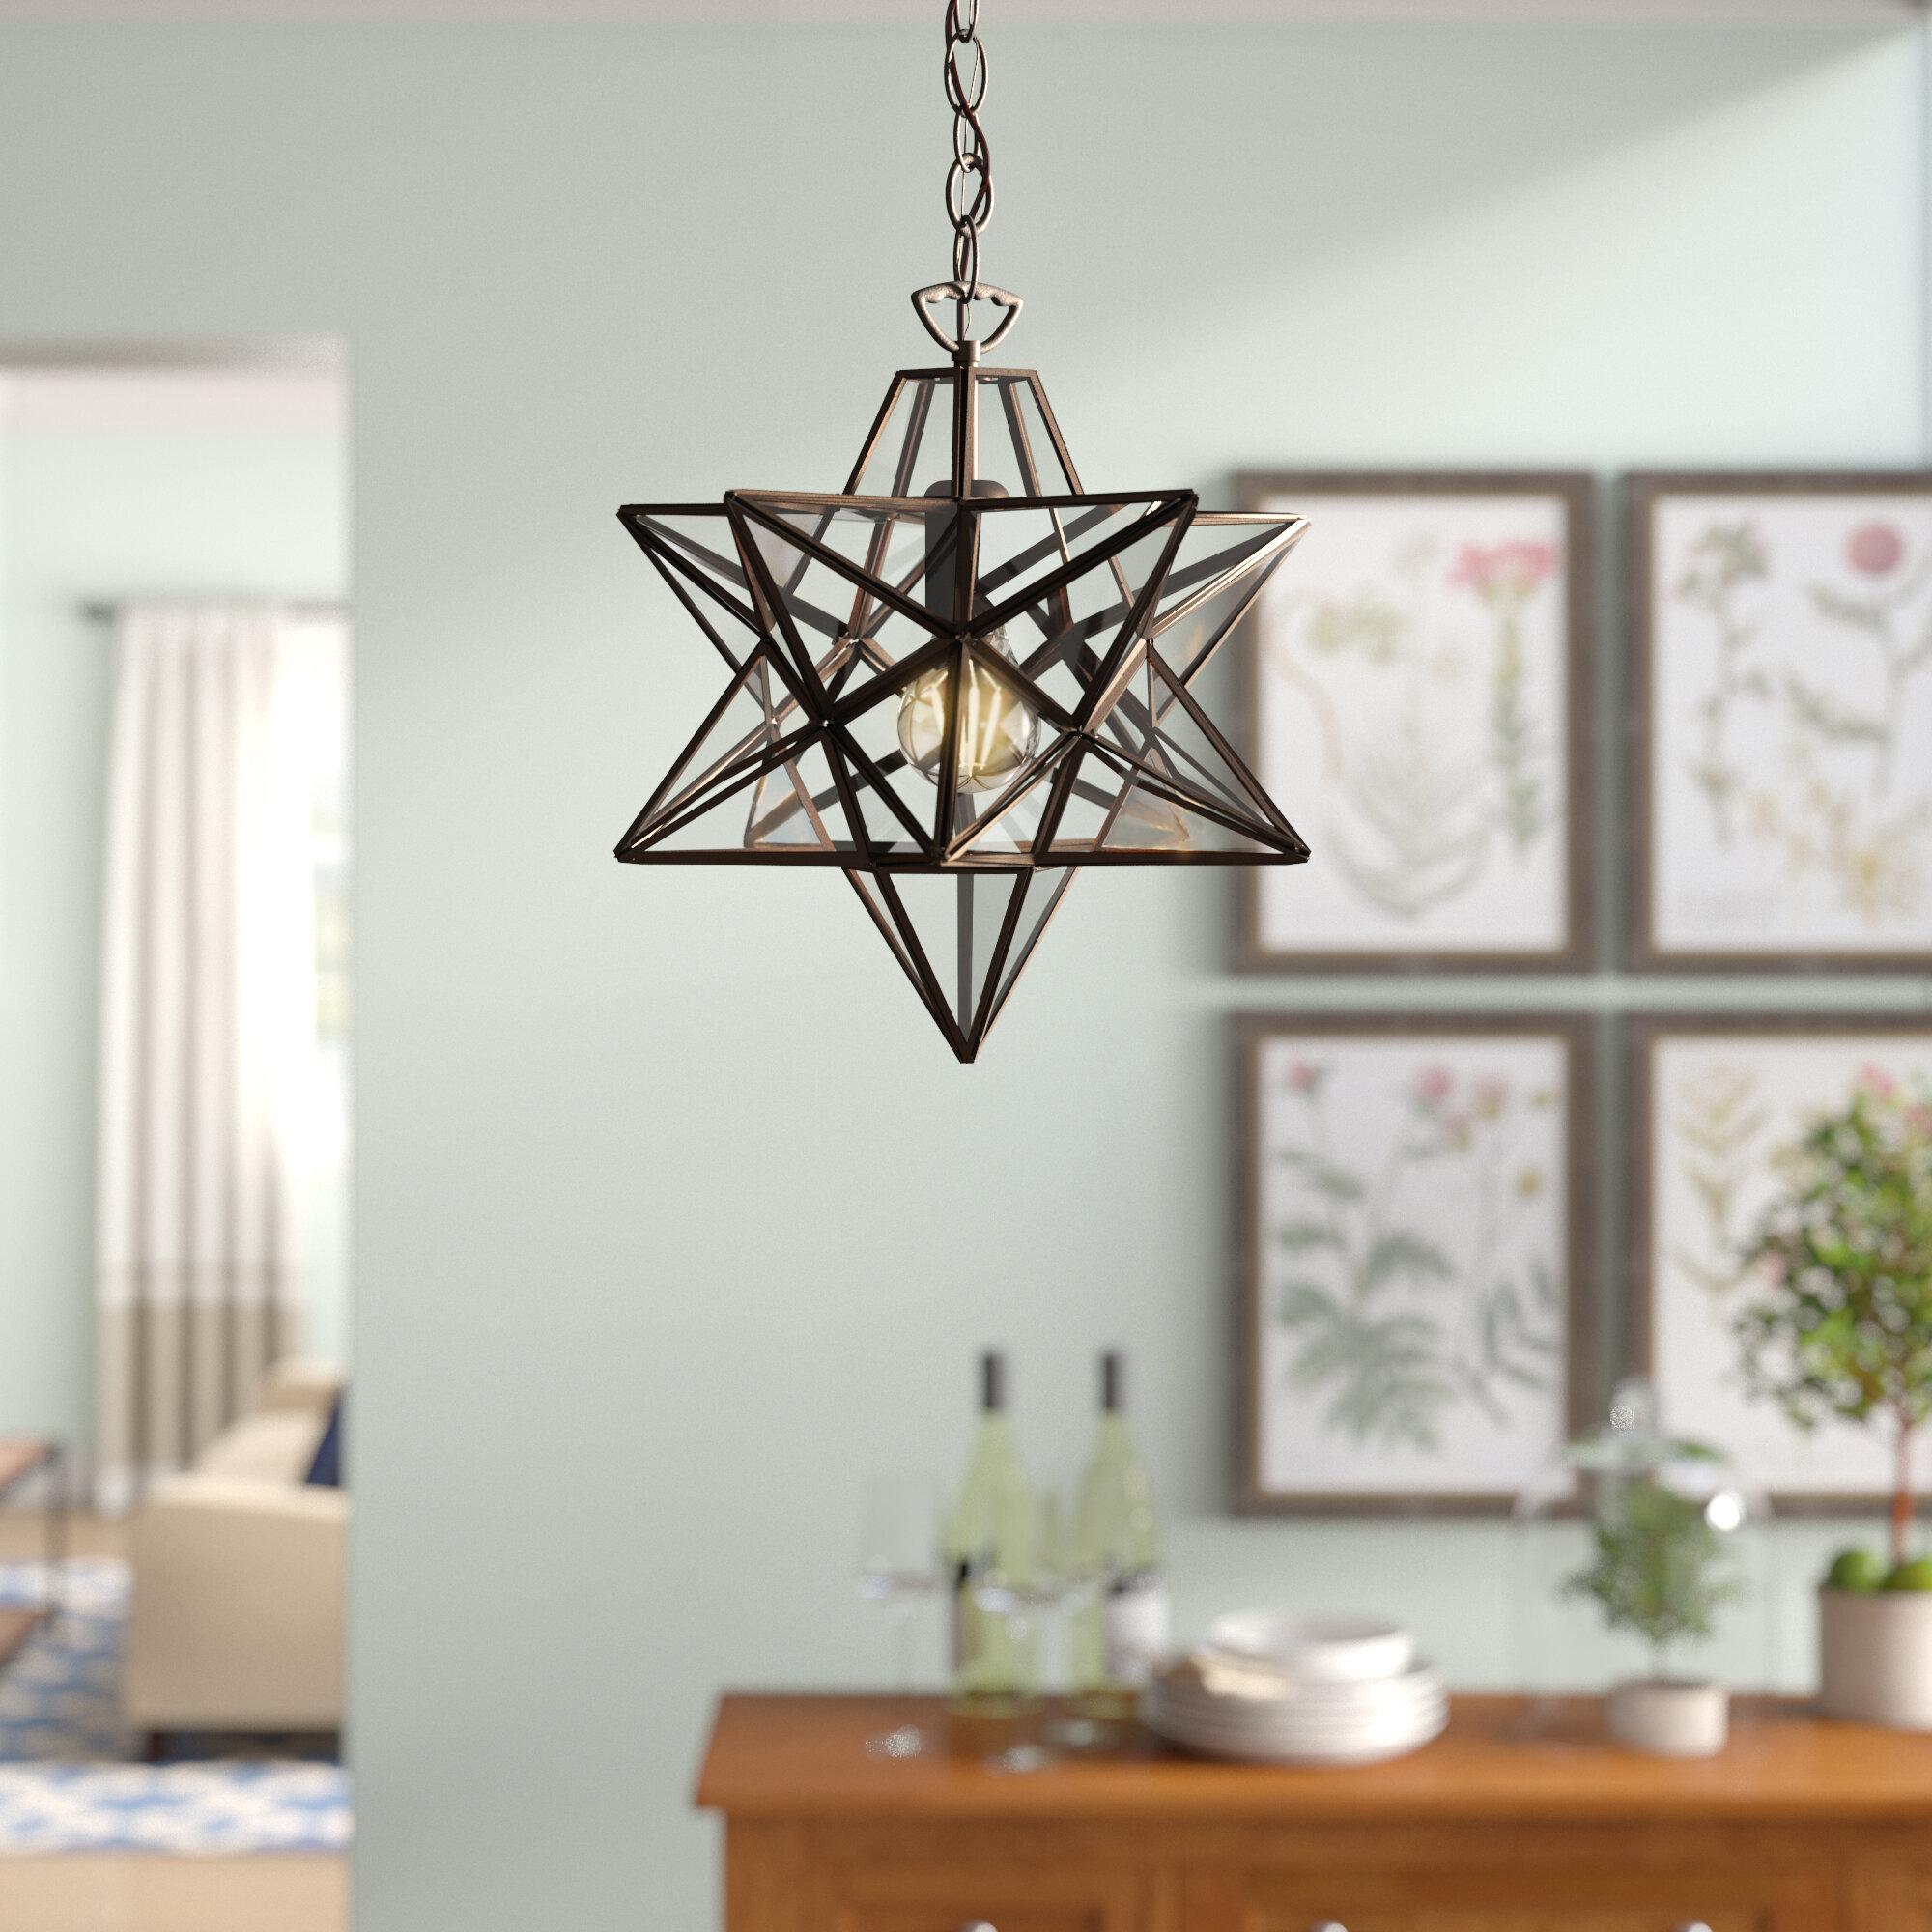 Pendant Lighting Youll Love Wayfair Extraordinary Light Wiring Kit Pics Decoration Inspiration Quickview